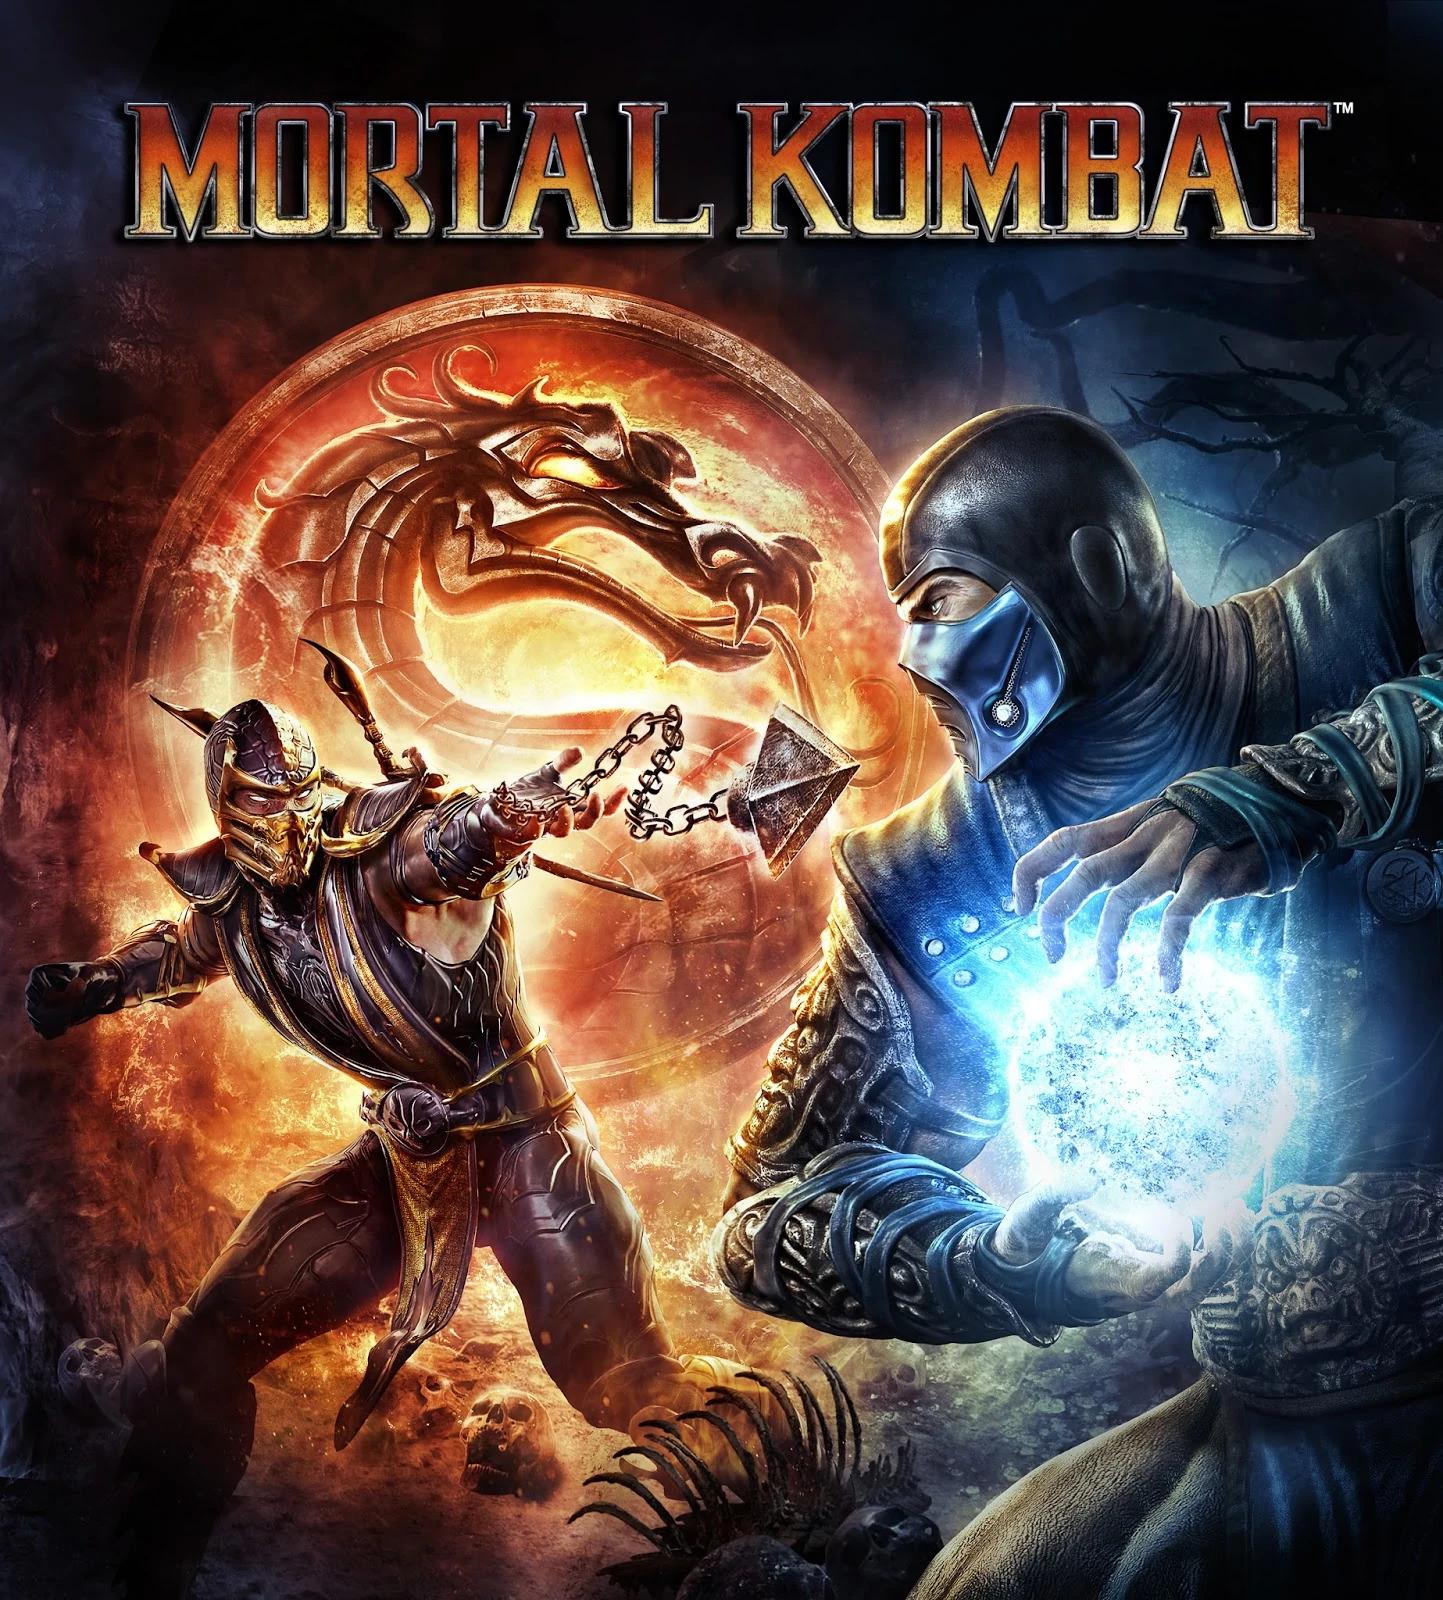 Mortal Kombat (2011 video game) | Mortal Kombat Wiki | FANDOM